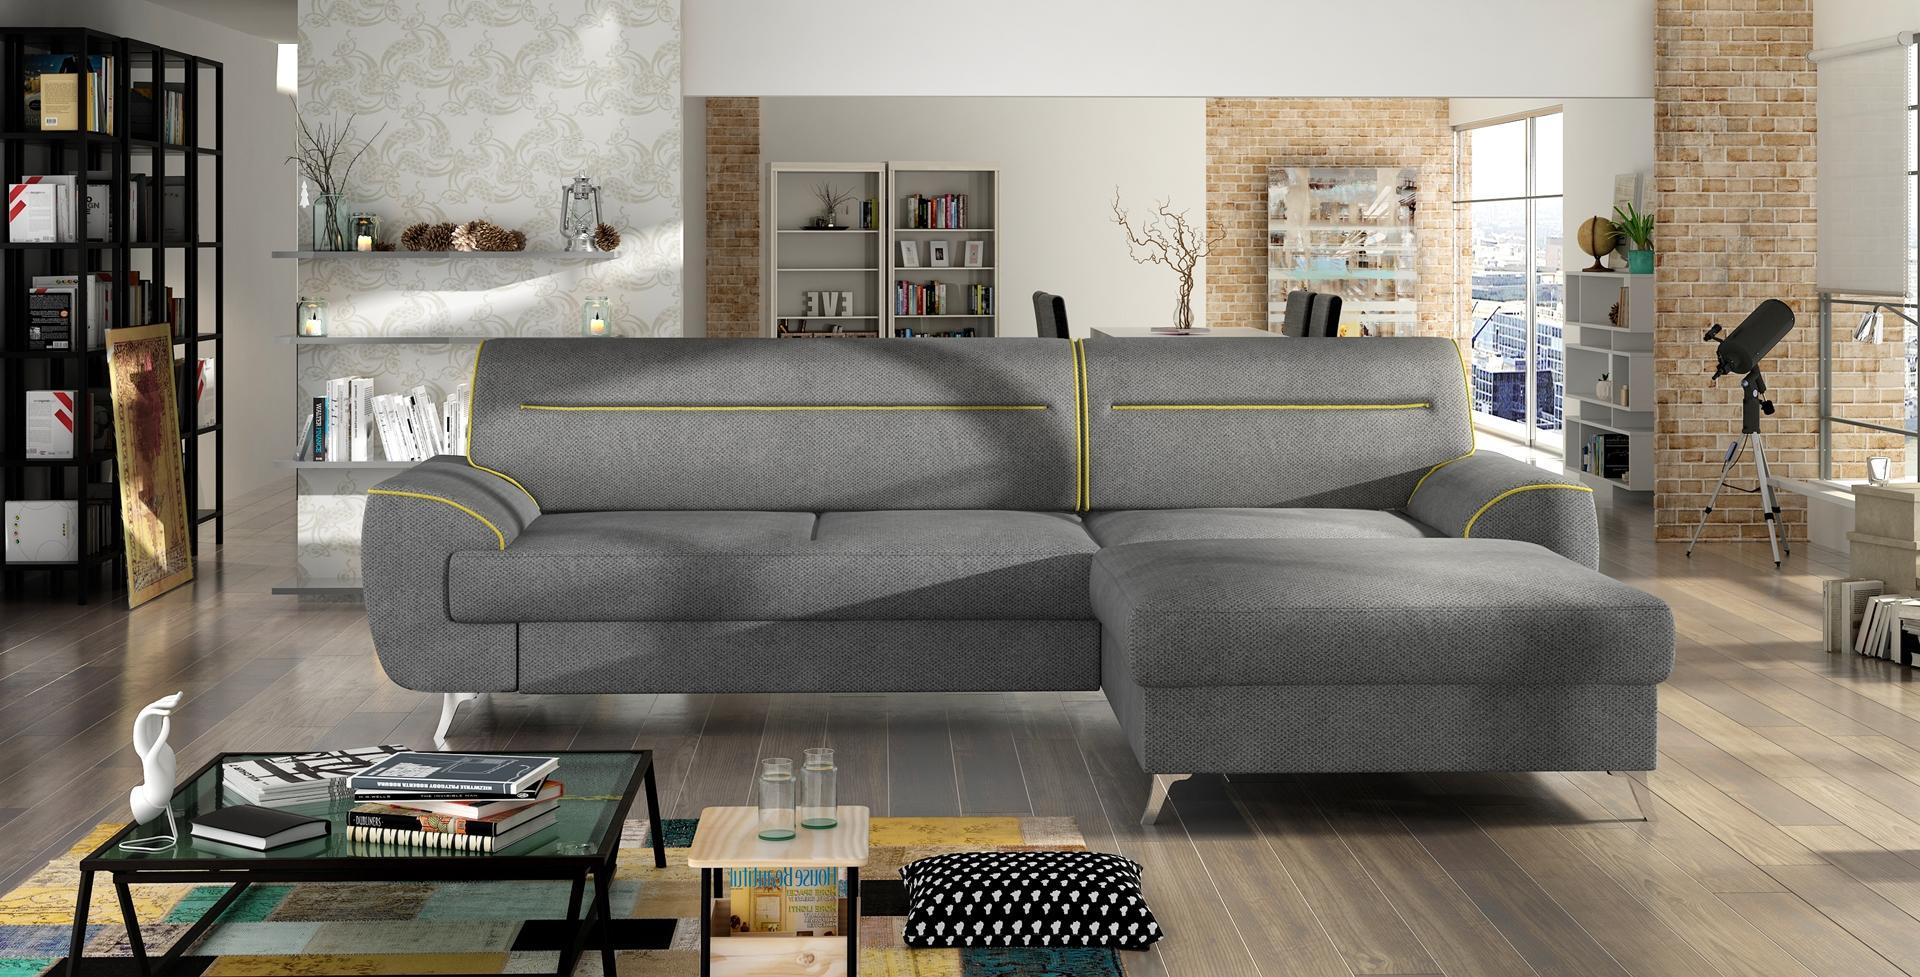 sofa schlafsofa designer sofa mit bettfunktion bettkasten ecksofa couch neu moon www. Black Bedroom Furniture Sets. Home Design Ideas